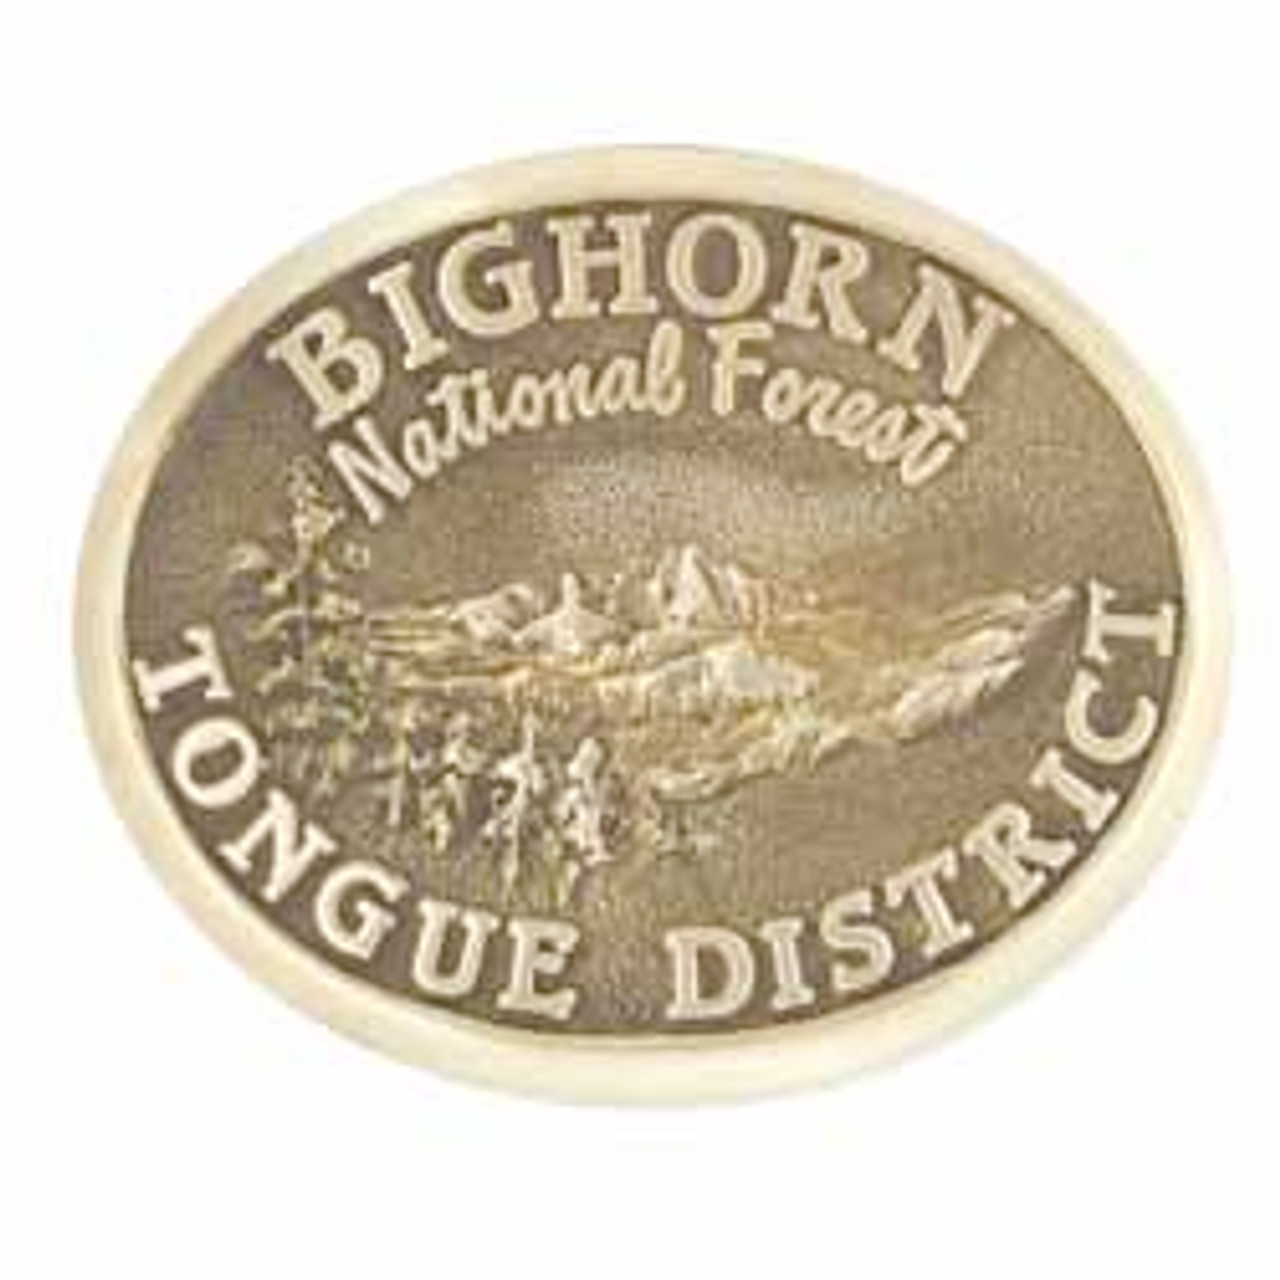 Tongue Ranger District Buckle